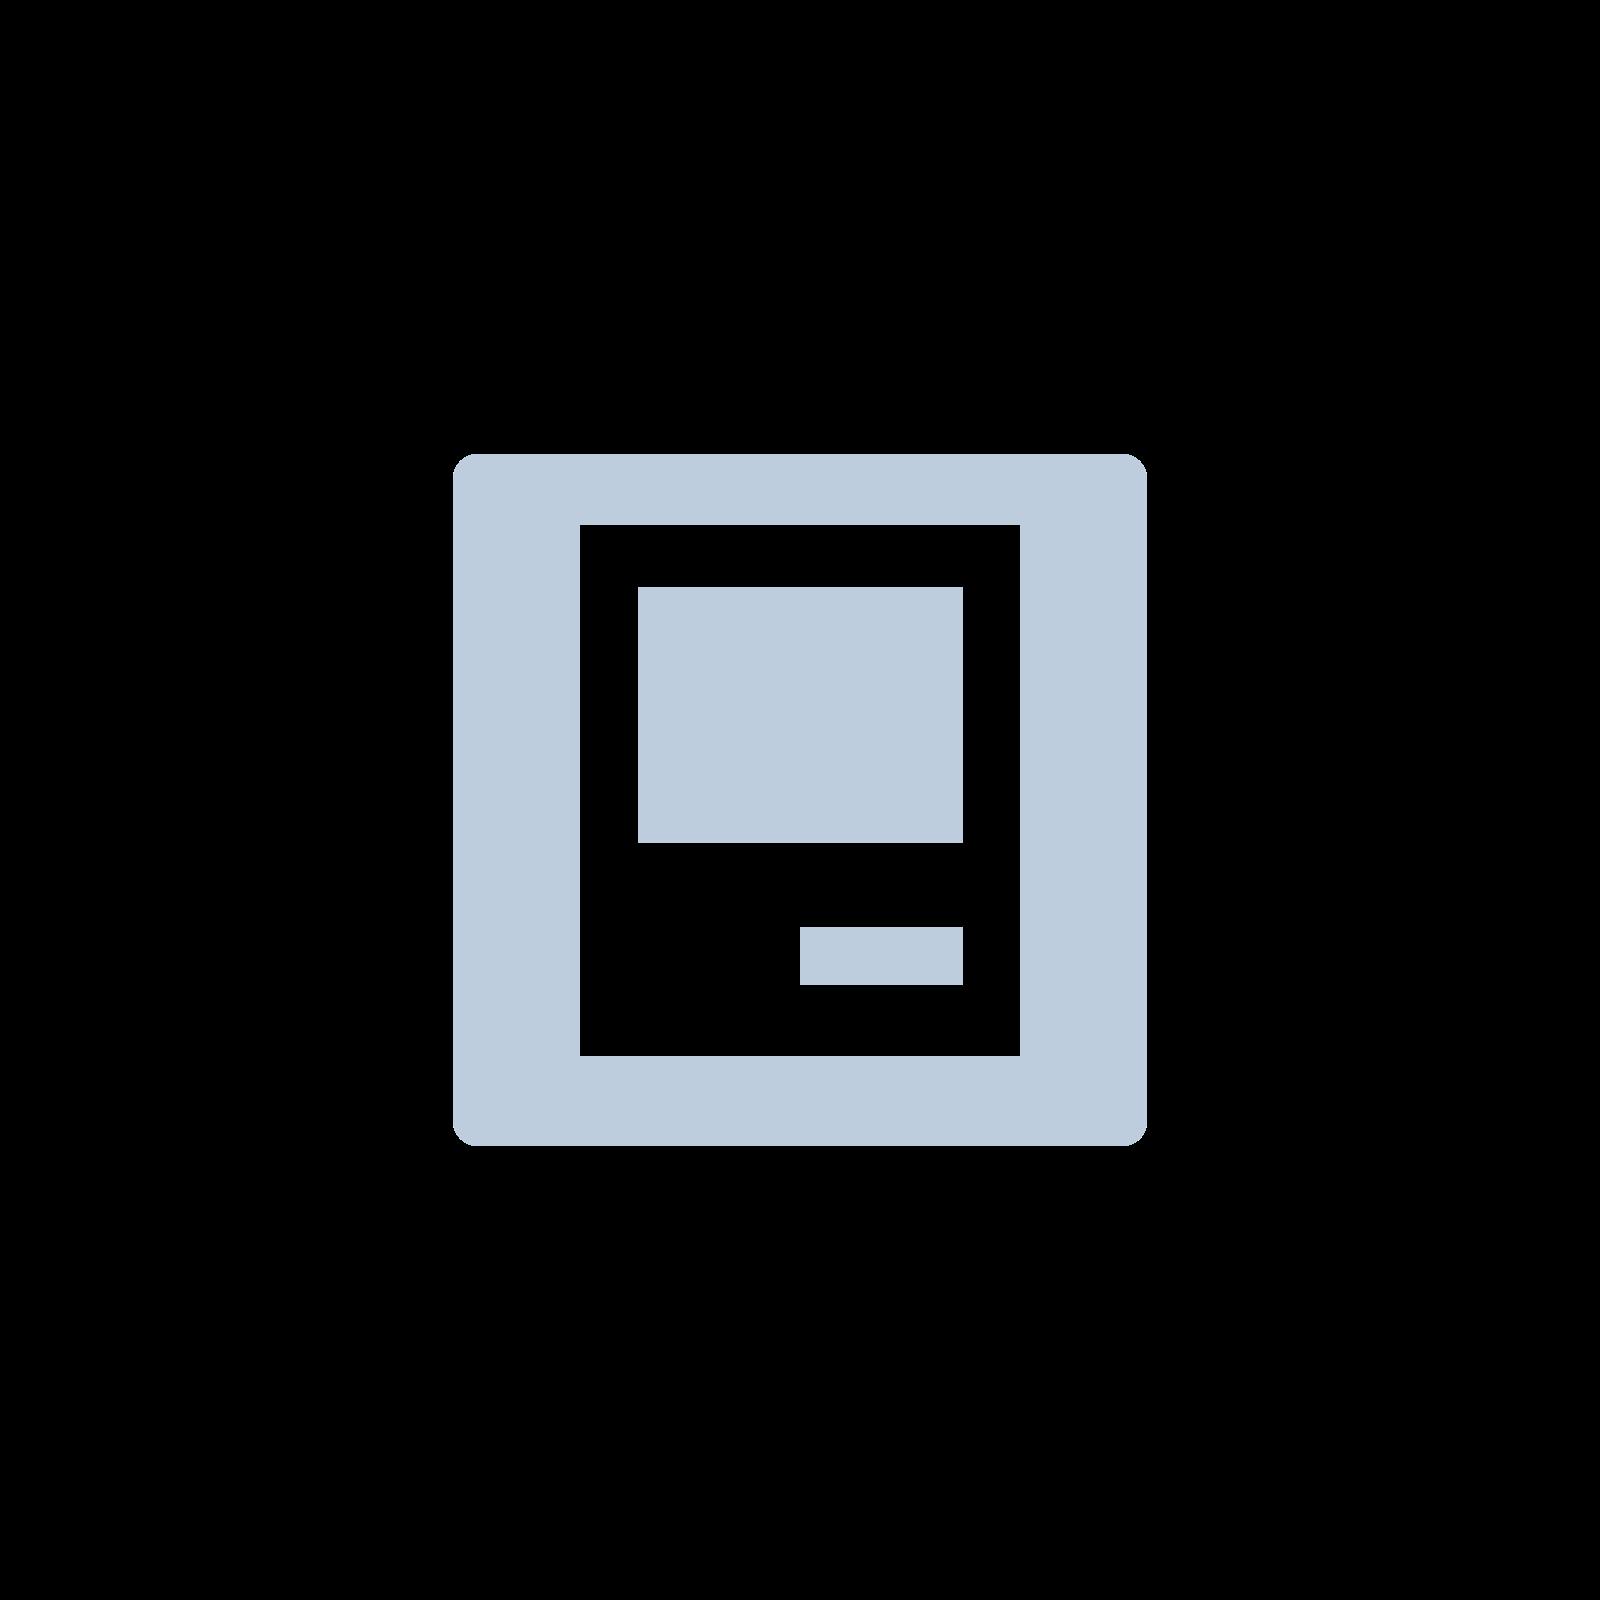 Mac mini Core 2 Duo 2.53 GHz (Macmini3,1, 500GB, 4GB)